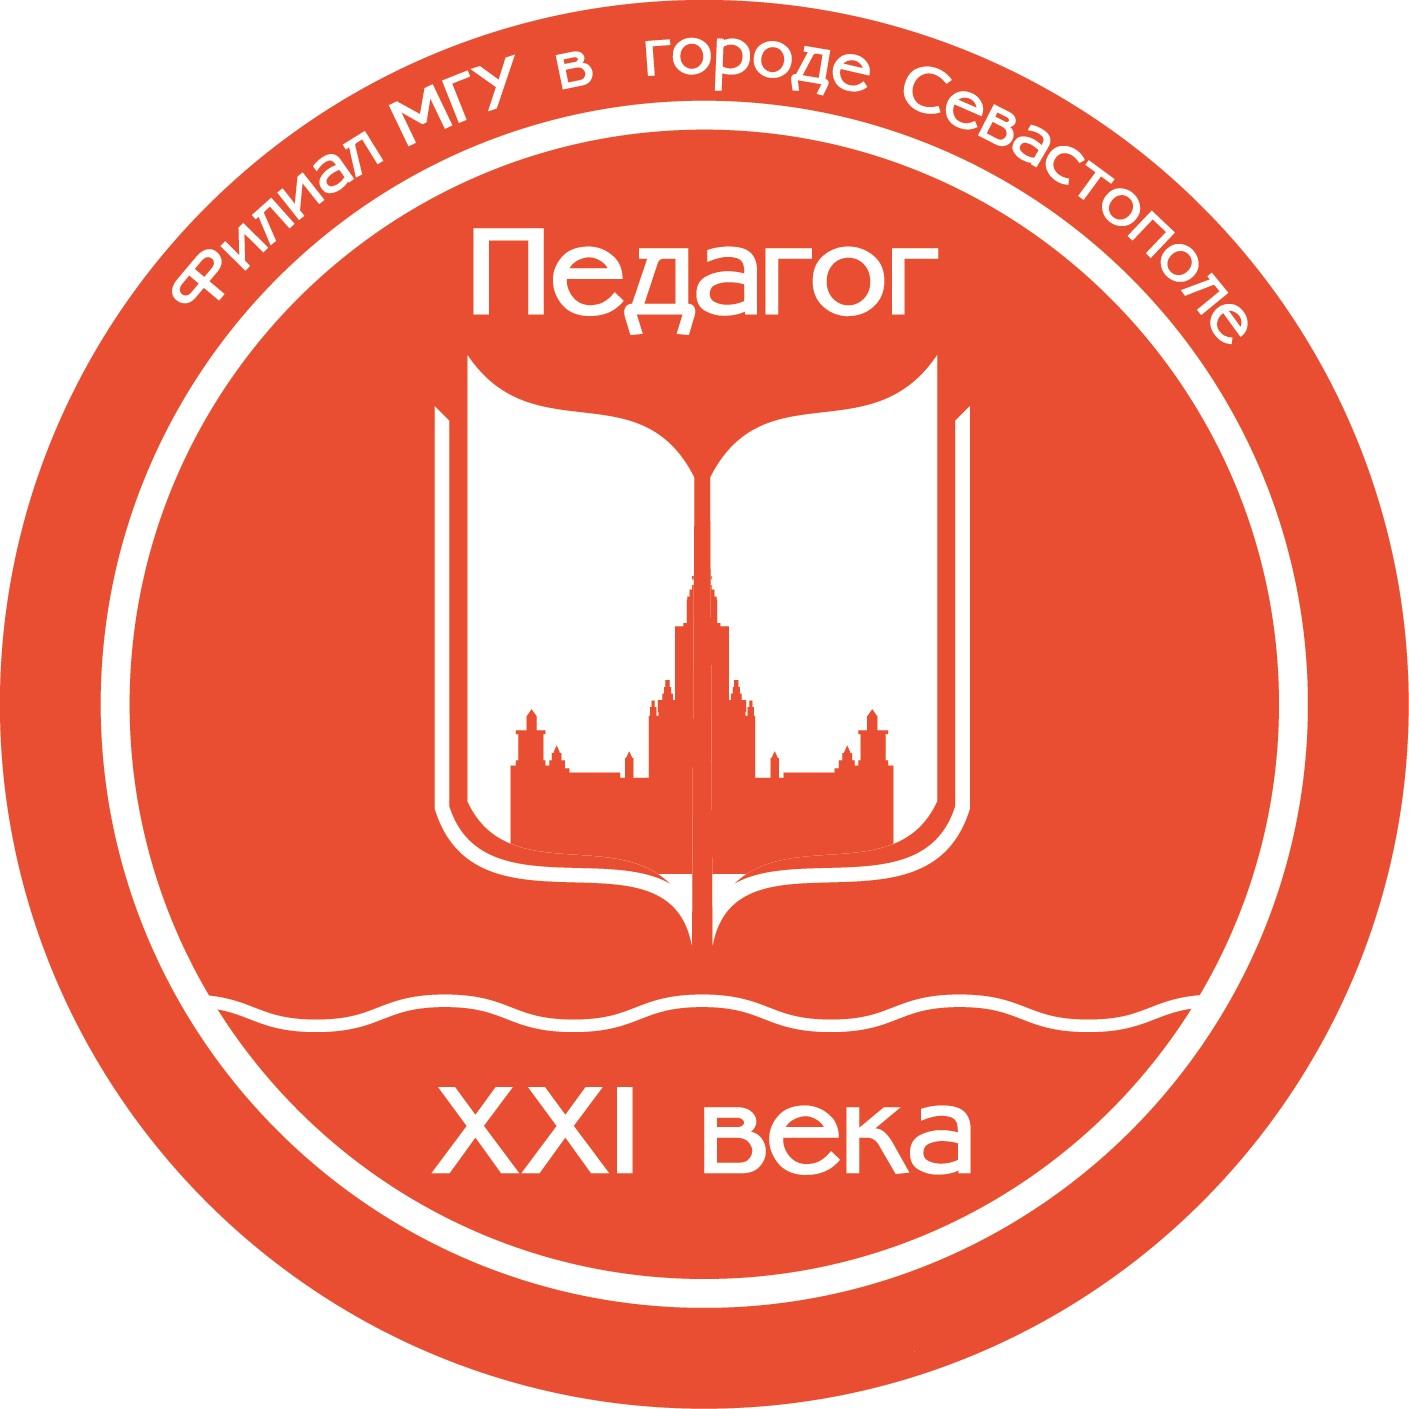 rus_logo_ca1ed4e0d745b634a02e76dd1200463de9bdf4ad